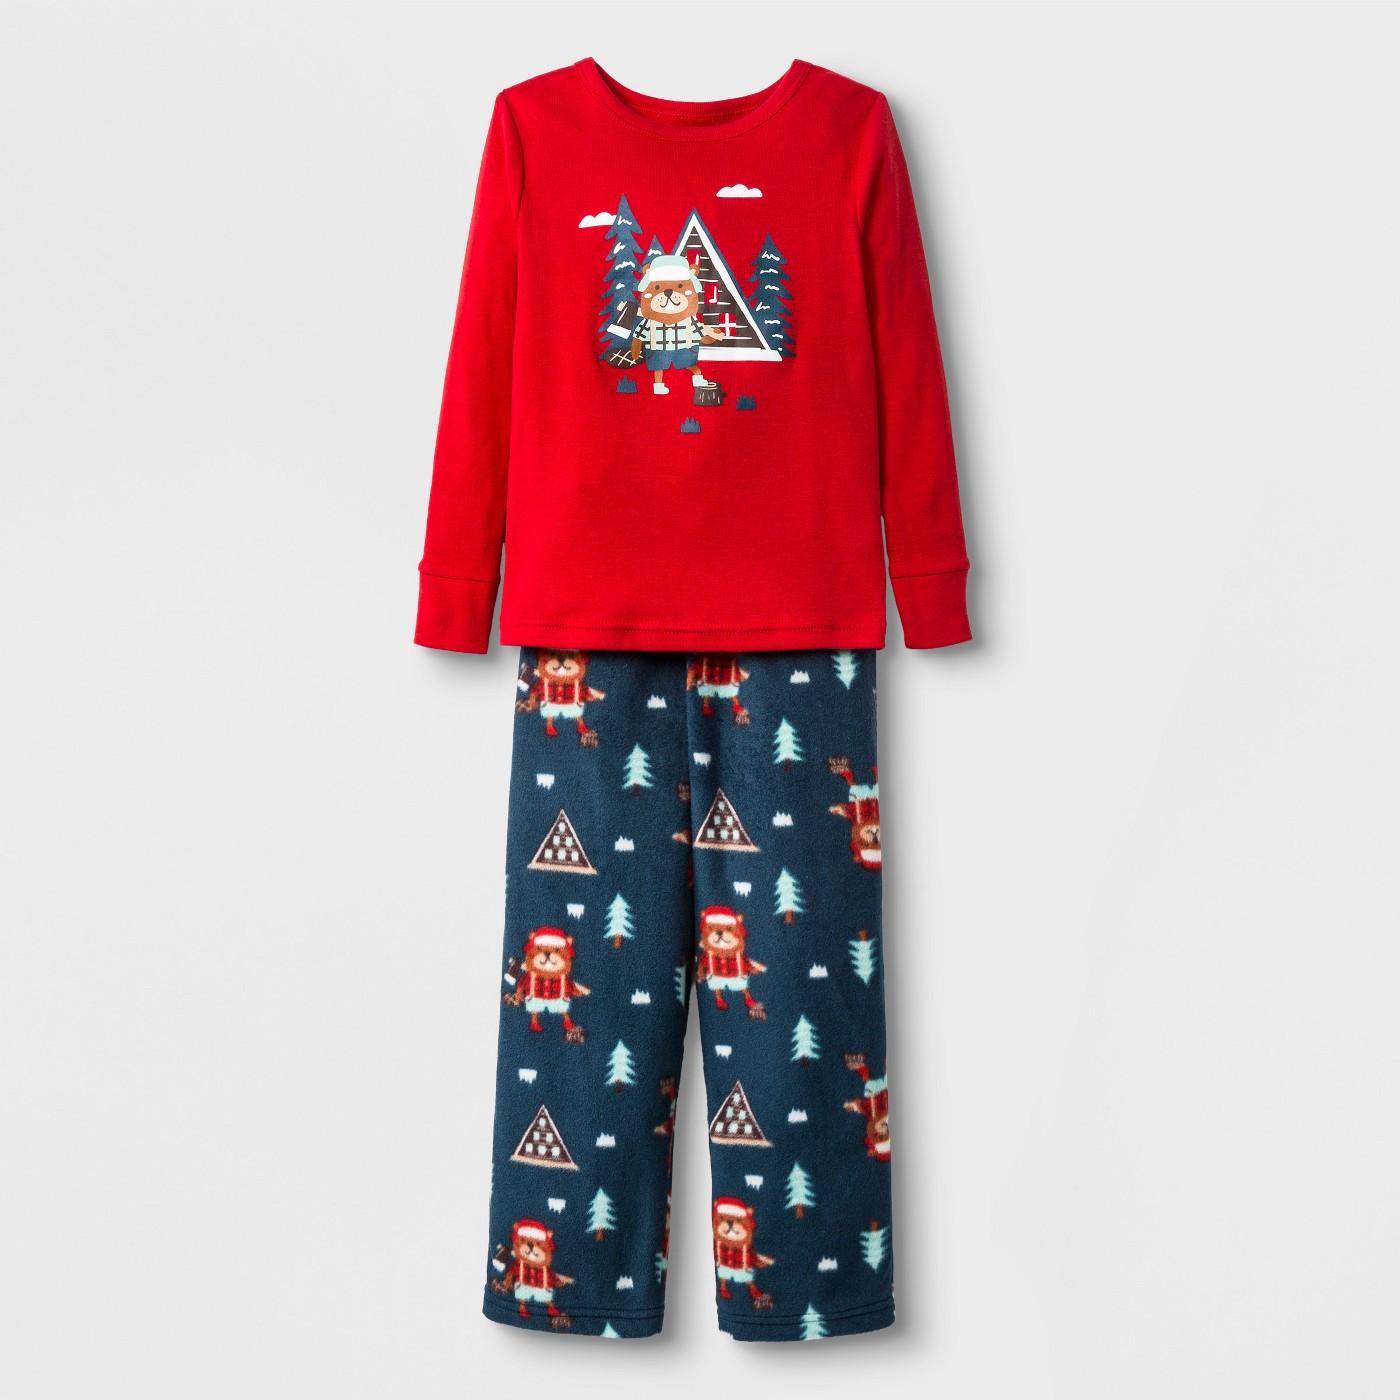 Target Deal – Toddler Pajamas 50% Off (Only $3.99)